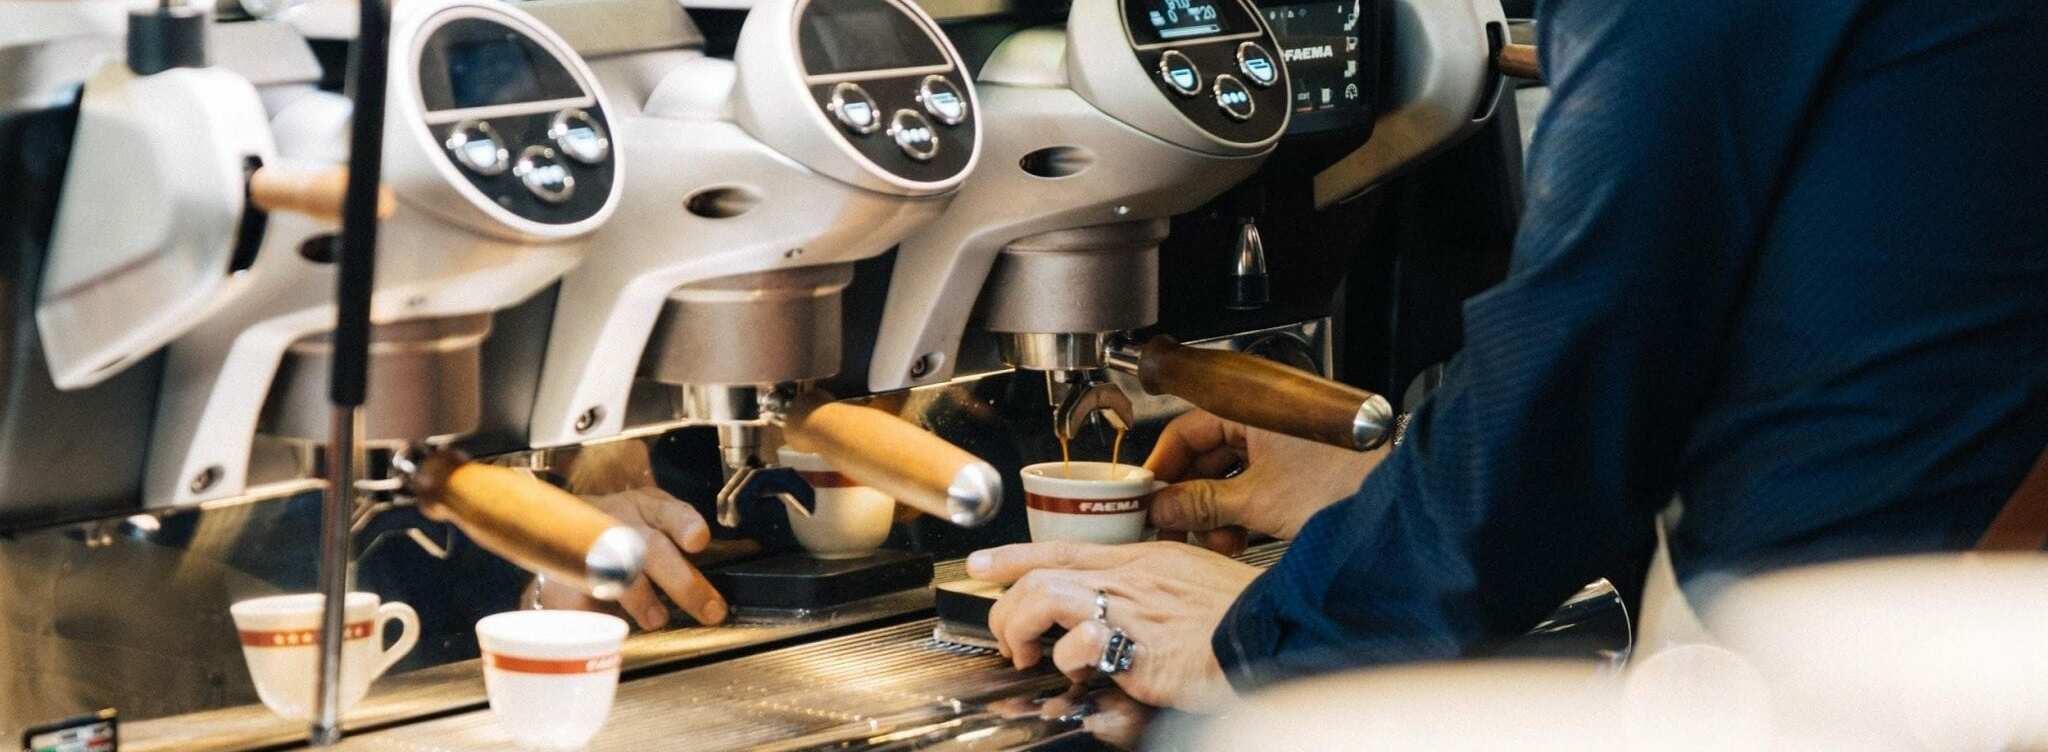 Barista making an espreeso with a Faema coffee machine